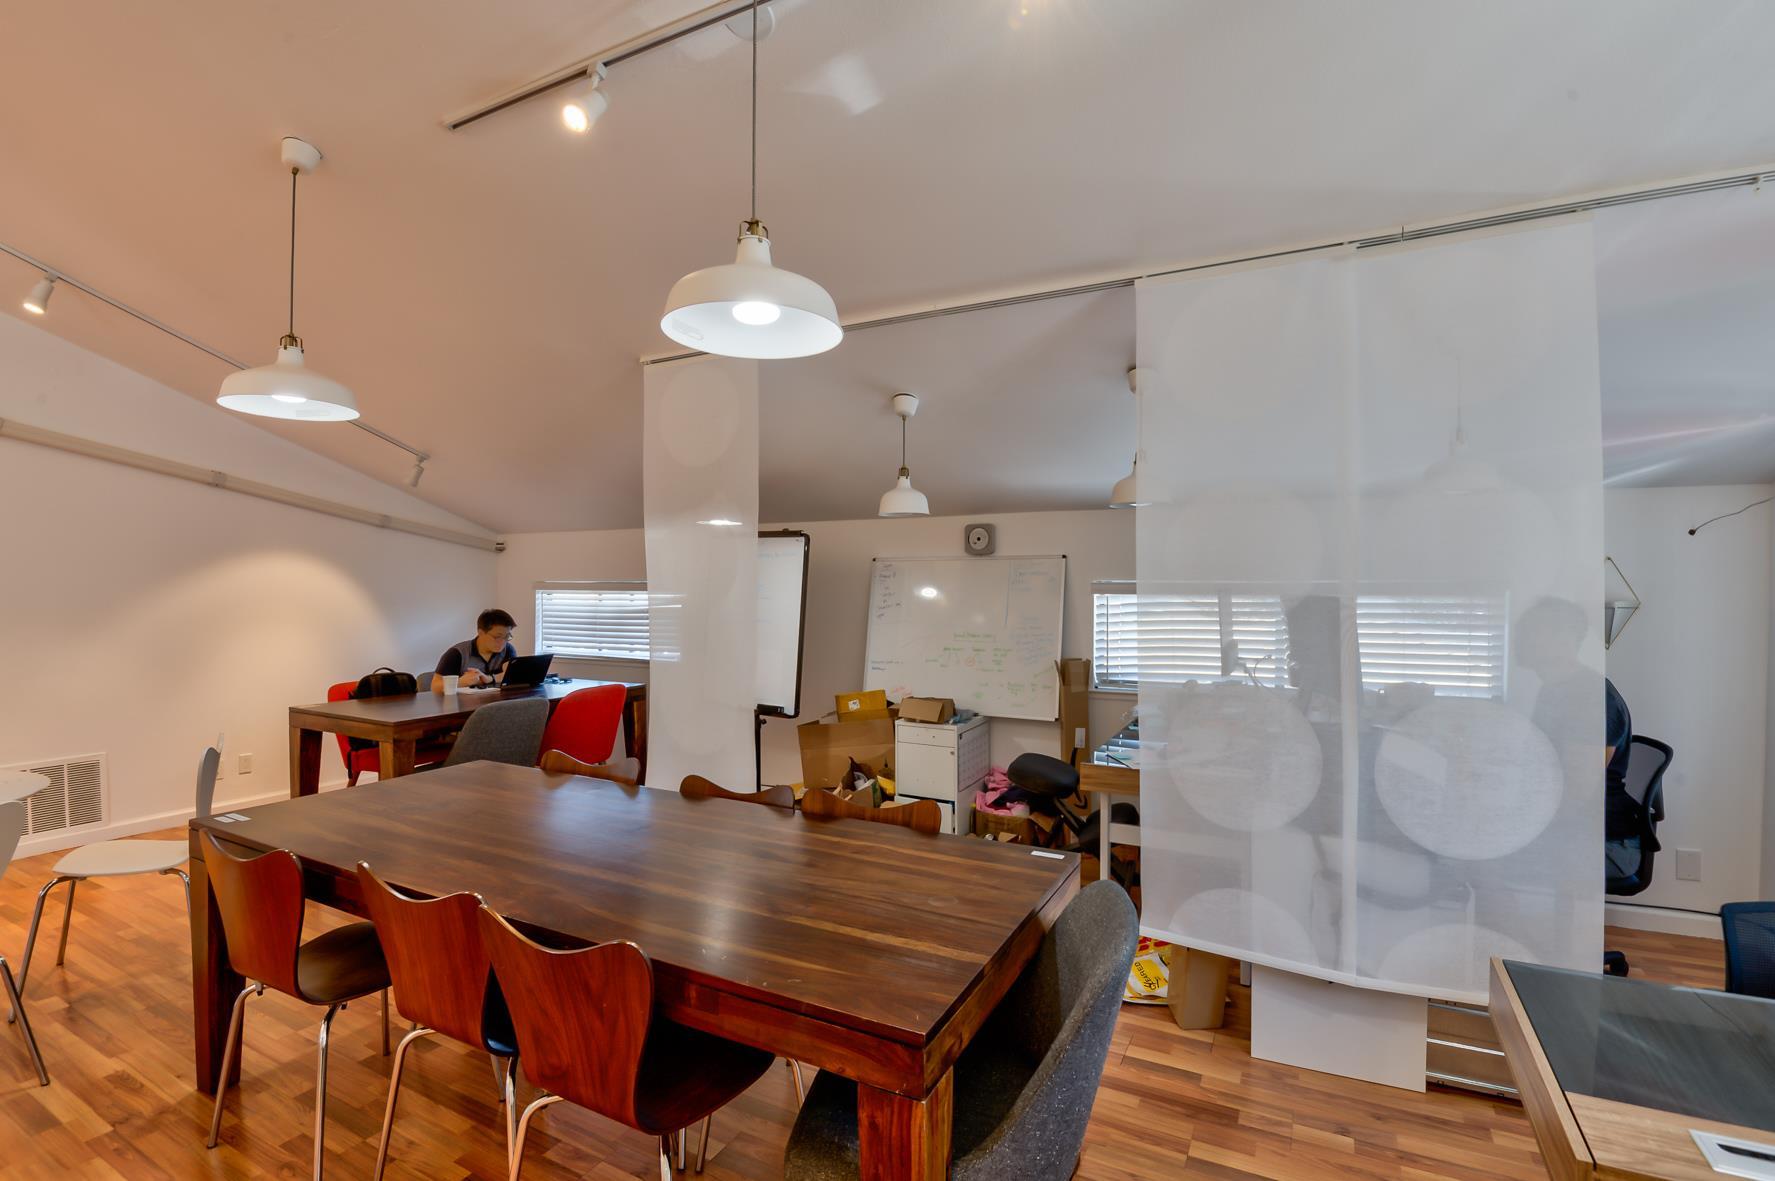 OnePiece SJ - Dedicated Desk for 6 people